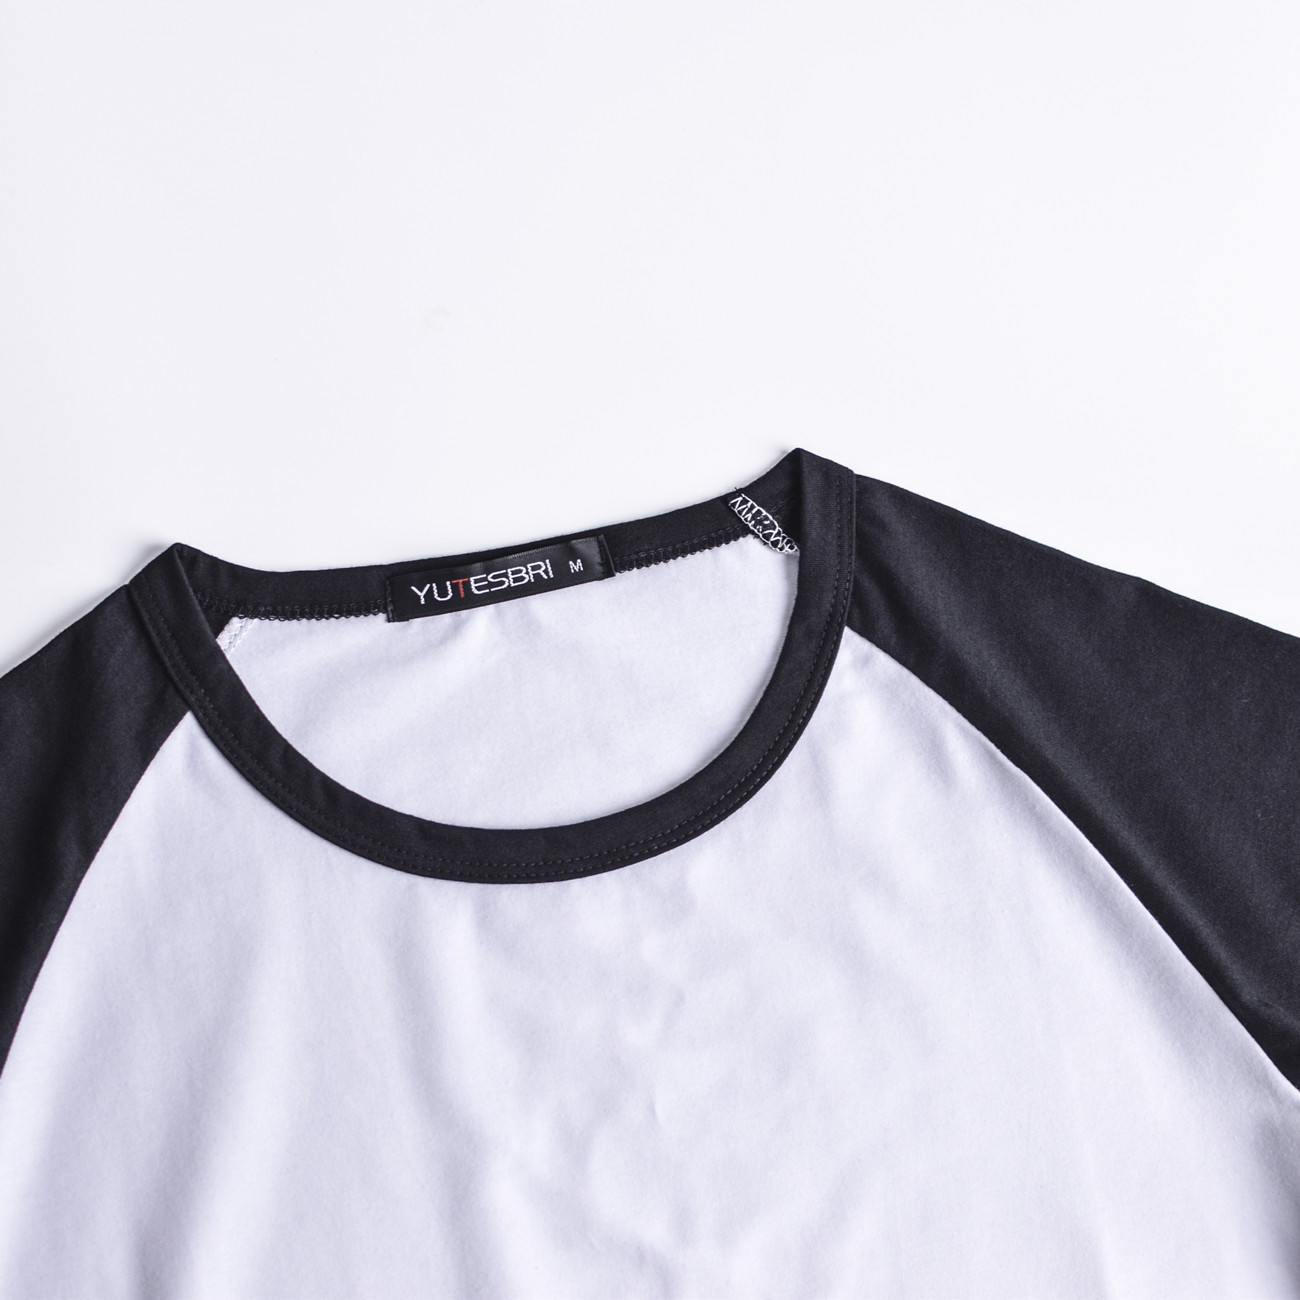 Custom Made Class Uniform Team Work Clothes T Shirts Customize